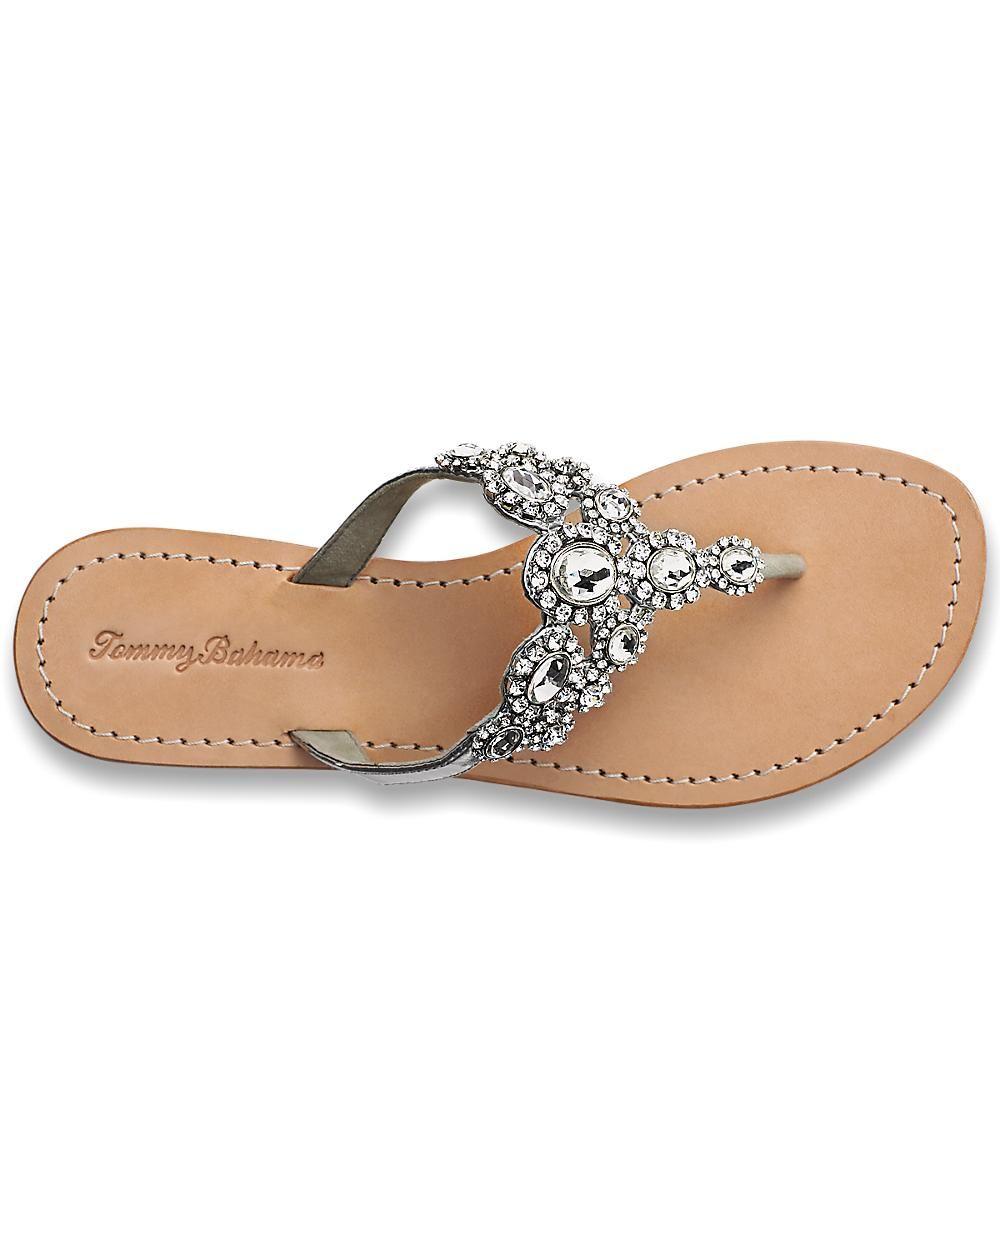 Flat rhinestone sandals for wedding - Wedding Crystal Flat Sandals Tommy Bahama 168 Loveeeee These